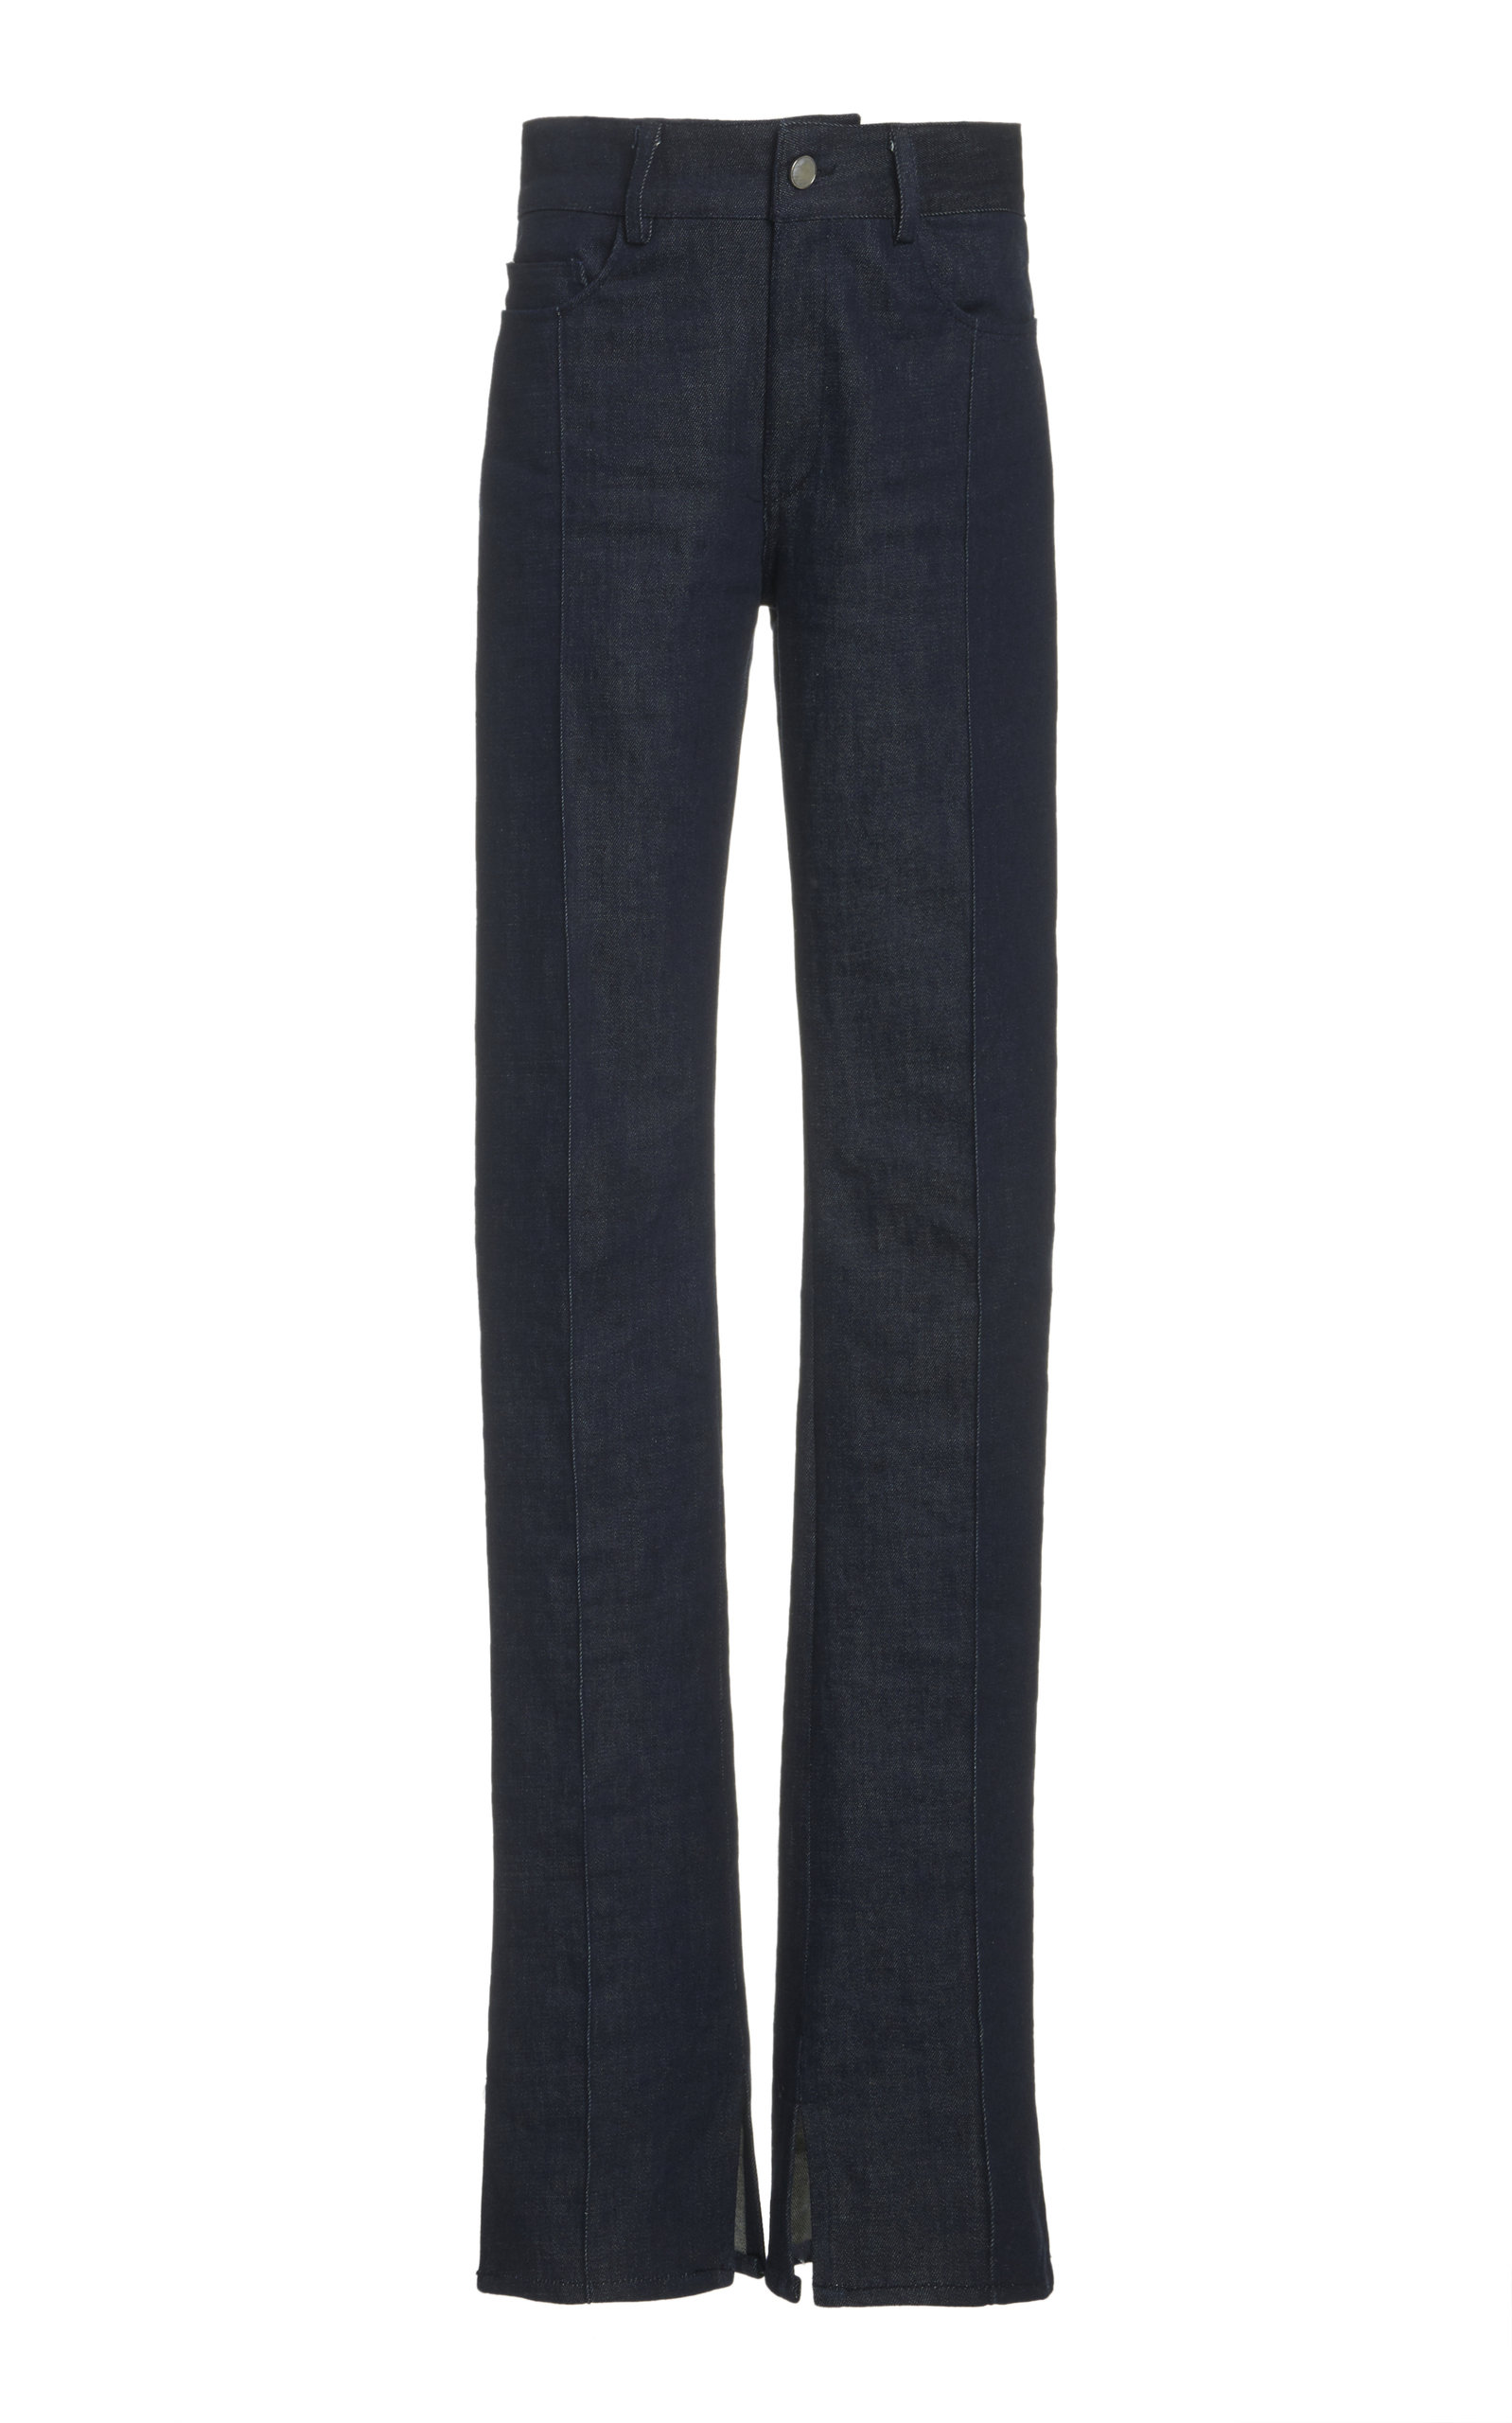 Women's Stretch High-Rise Skinny-Leg Jeans